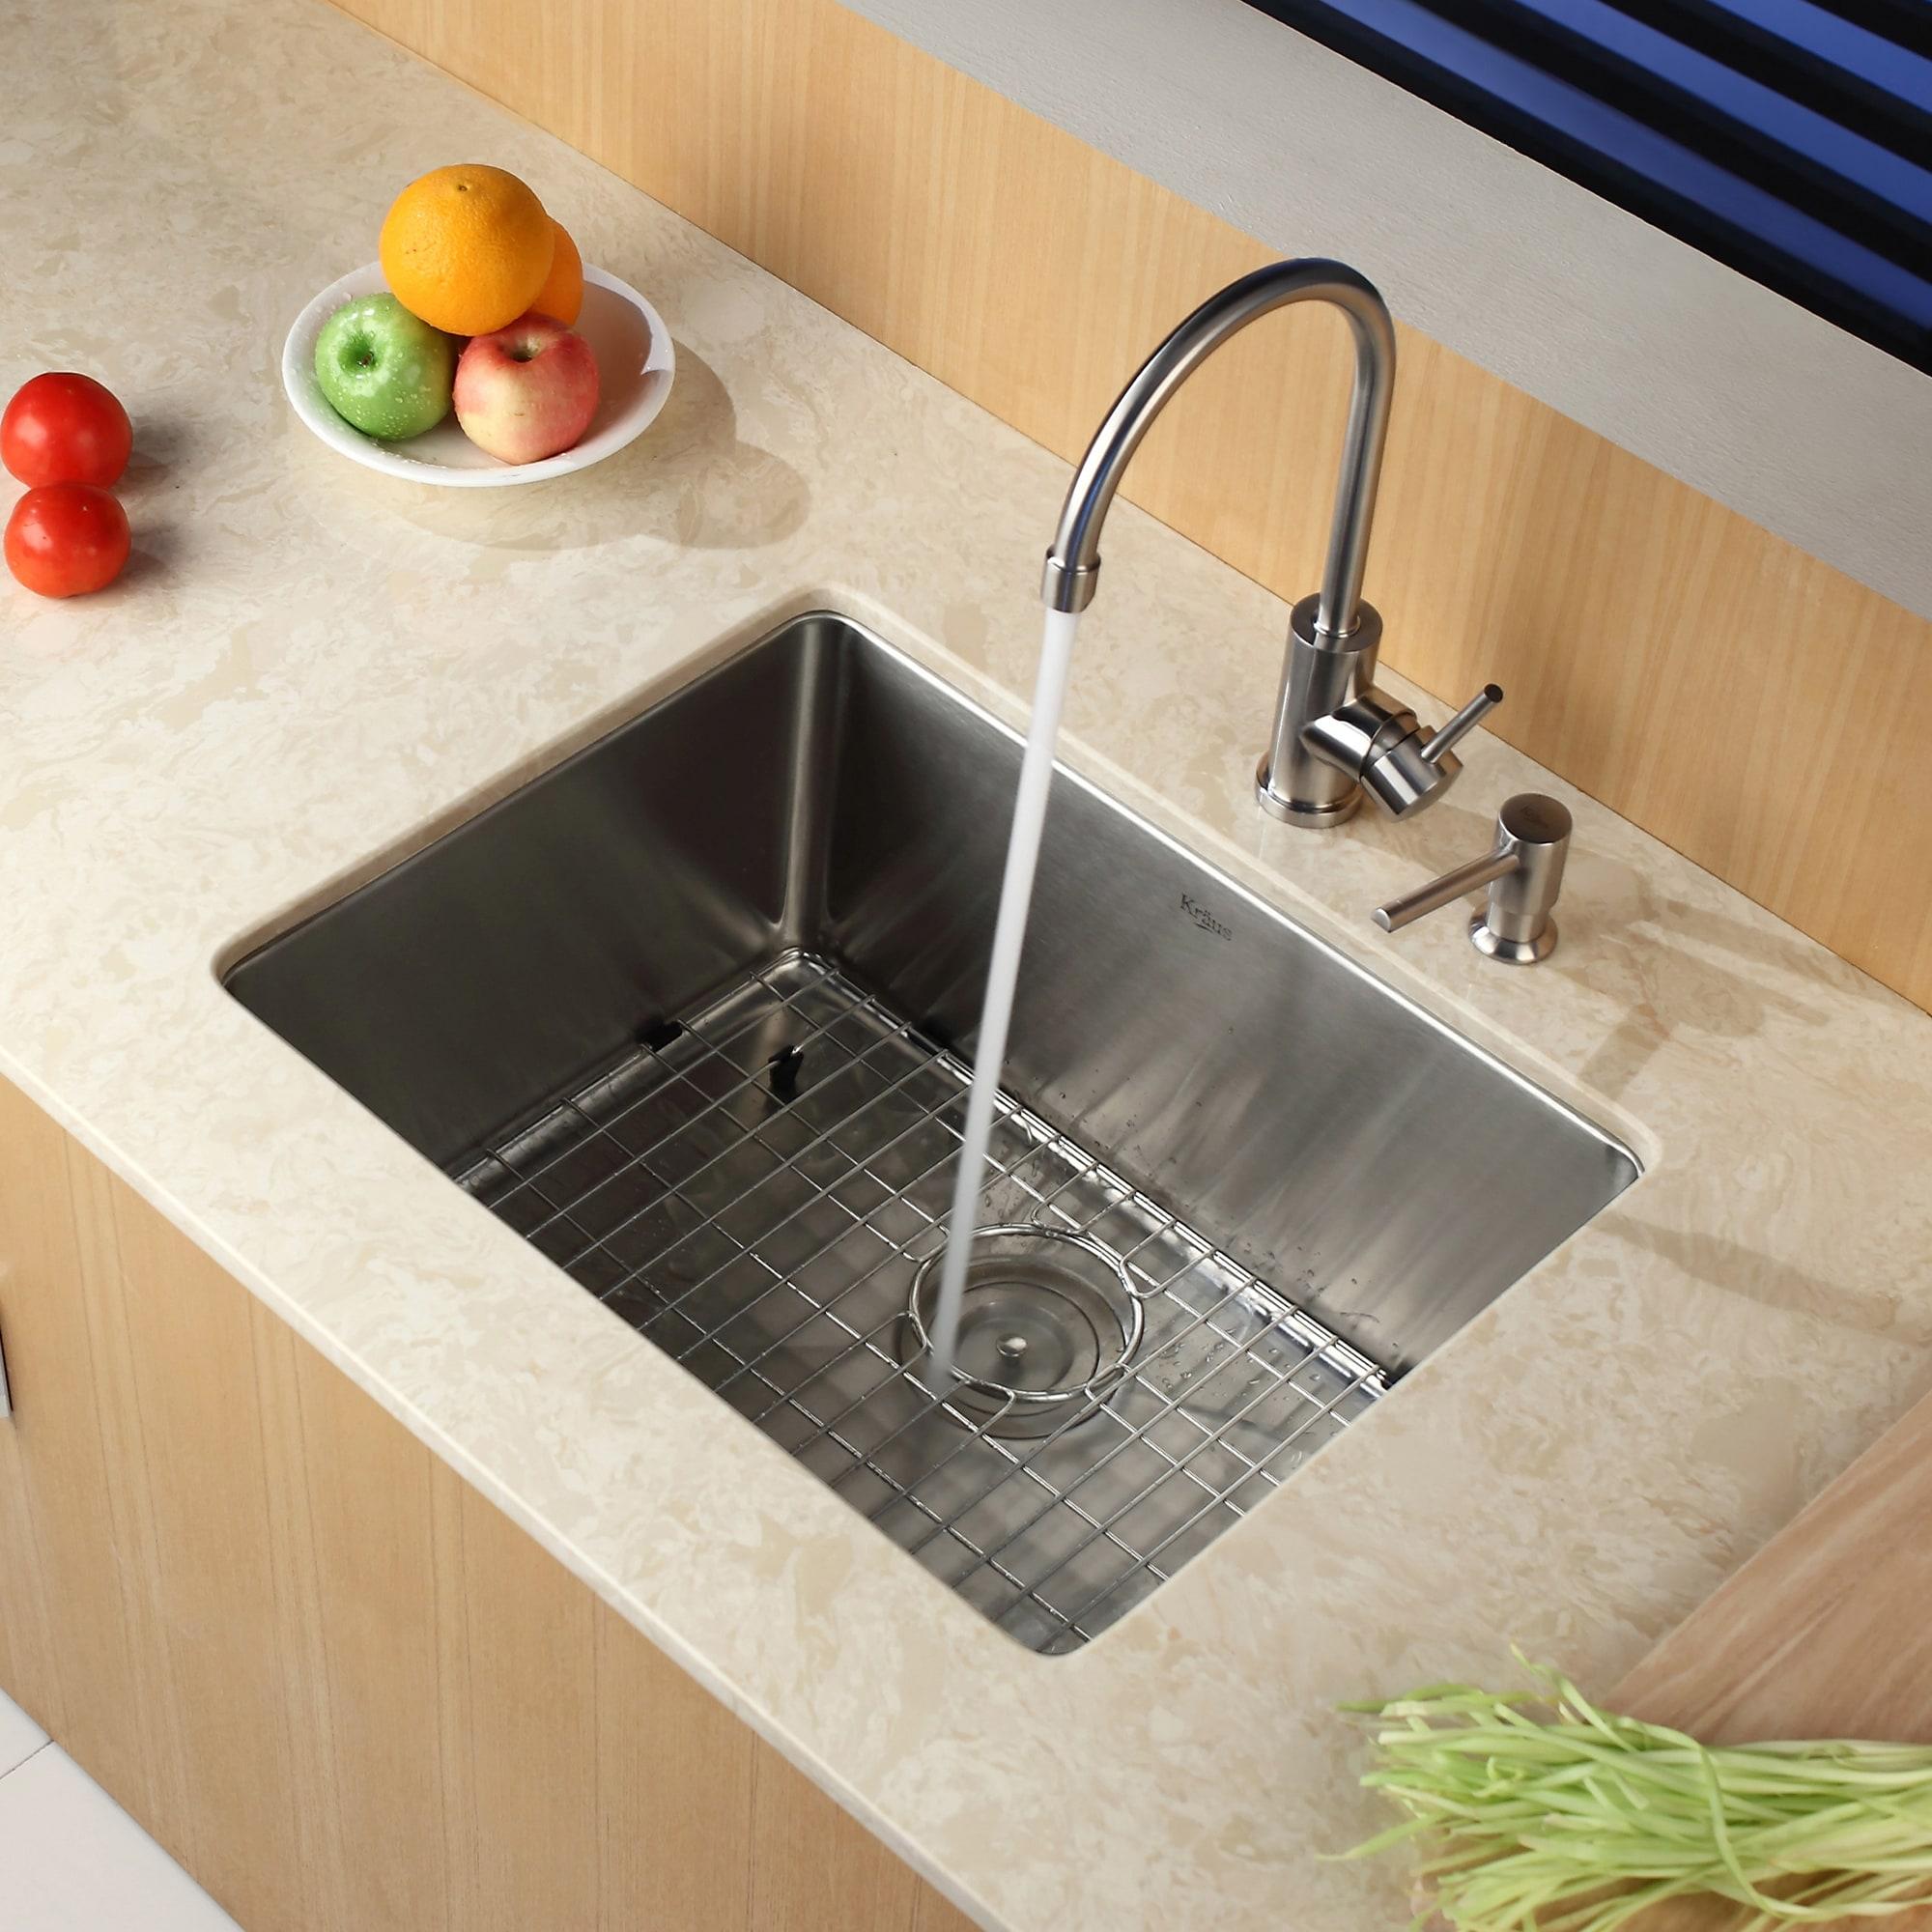 Shop kraus khu101 23 standart pro undermount 23 inch 16 gauge single bowl satin stainless steel kitchen sink free shipping today overstock com 3730988